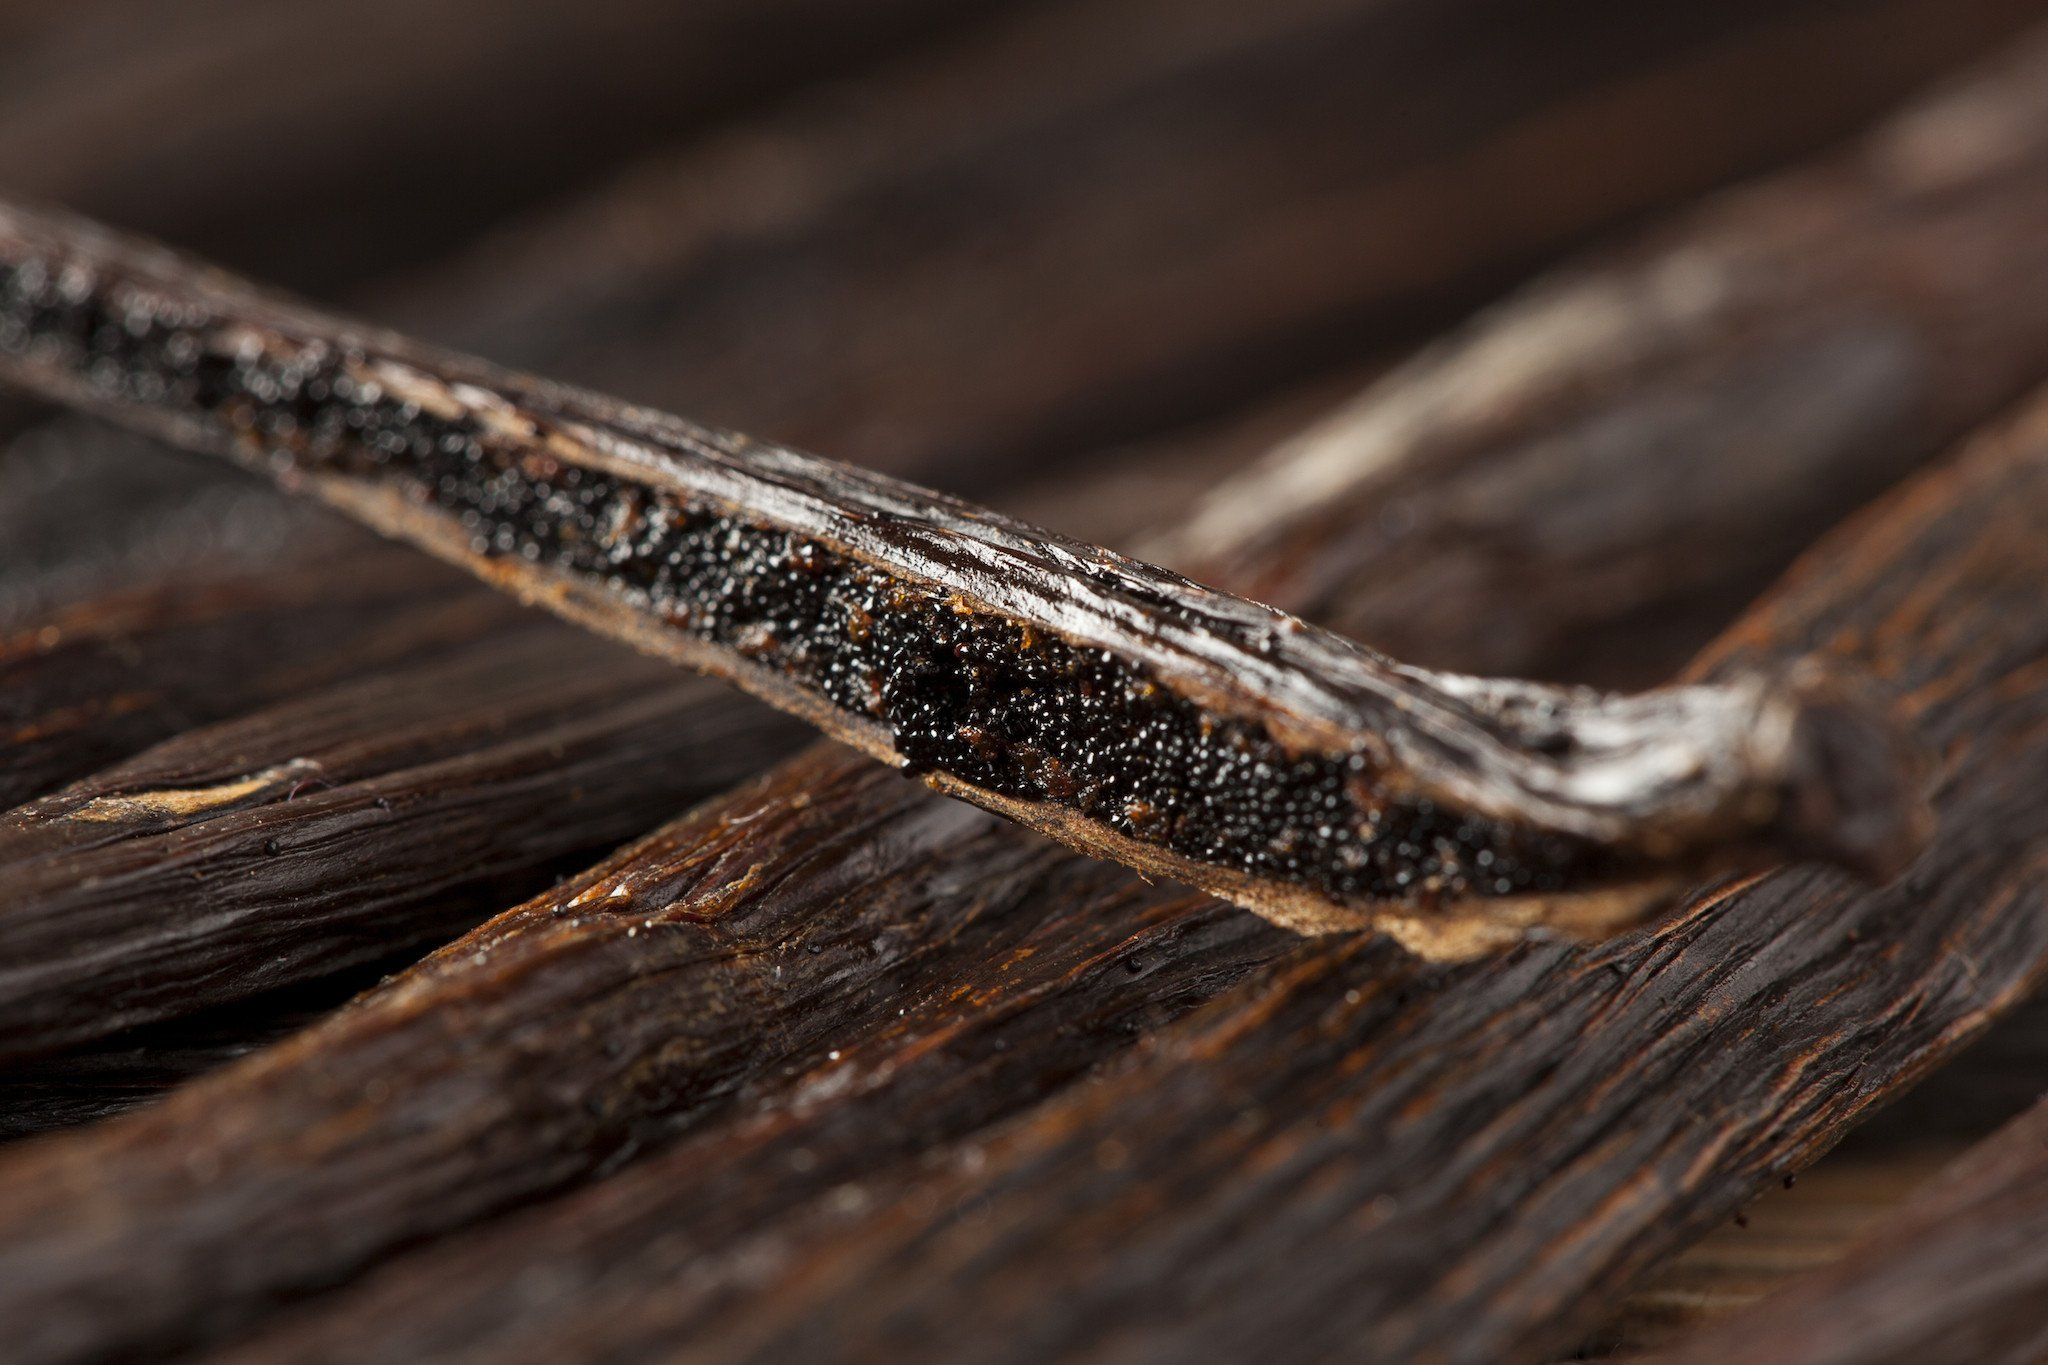 Madagascar Vanilla Beans. Whole Grade A Vanilla Pods for Vanilla Extract and Baking (50 Beans)